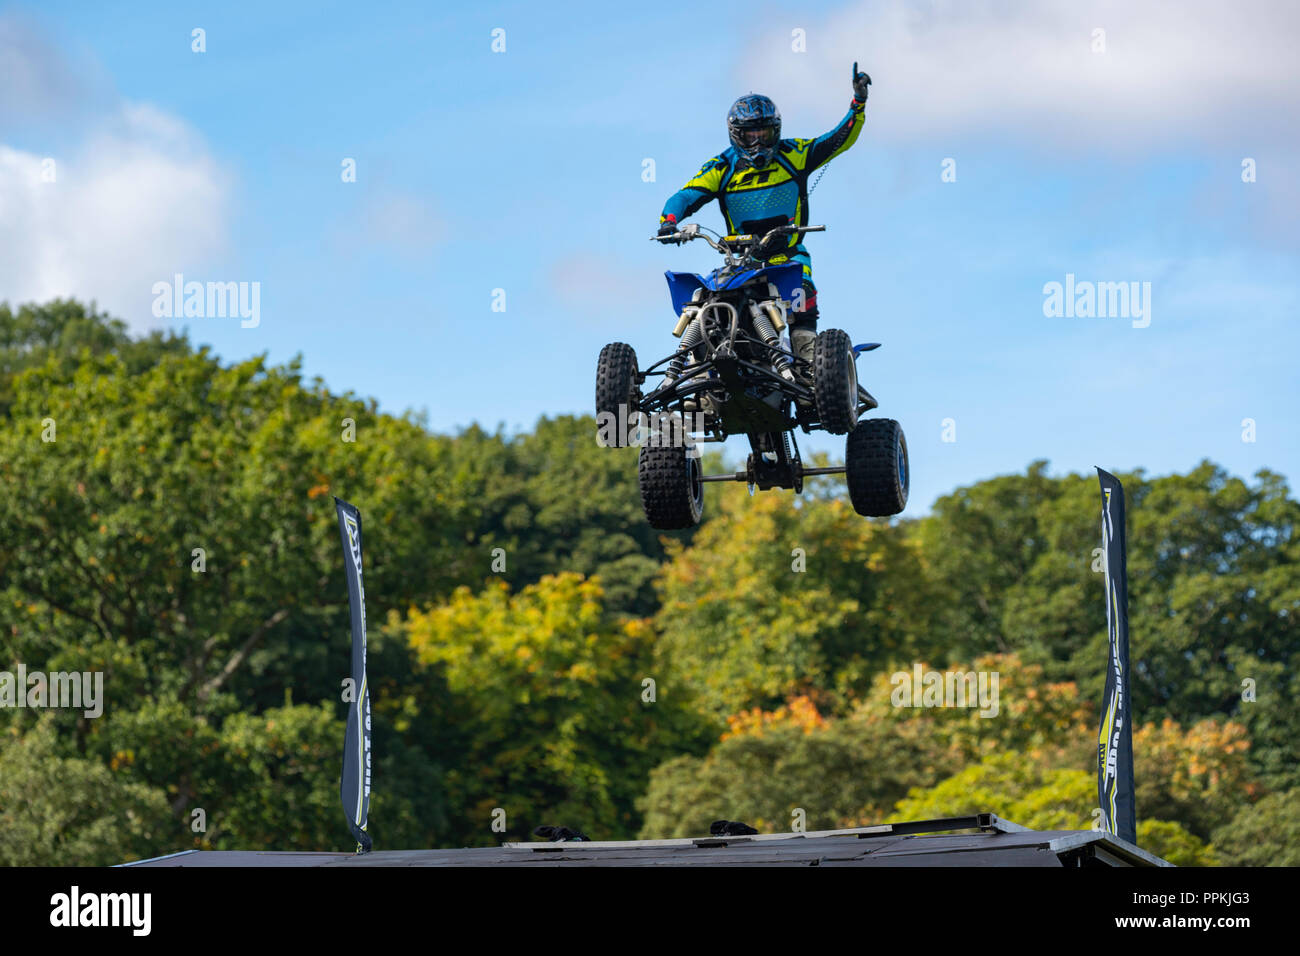 Quad Bike stuntman performing a mid-air jump at The Nidderdale Show,Pateley Bridge,North Yorkshire,England,UK. - Stock Image